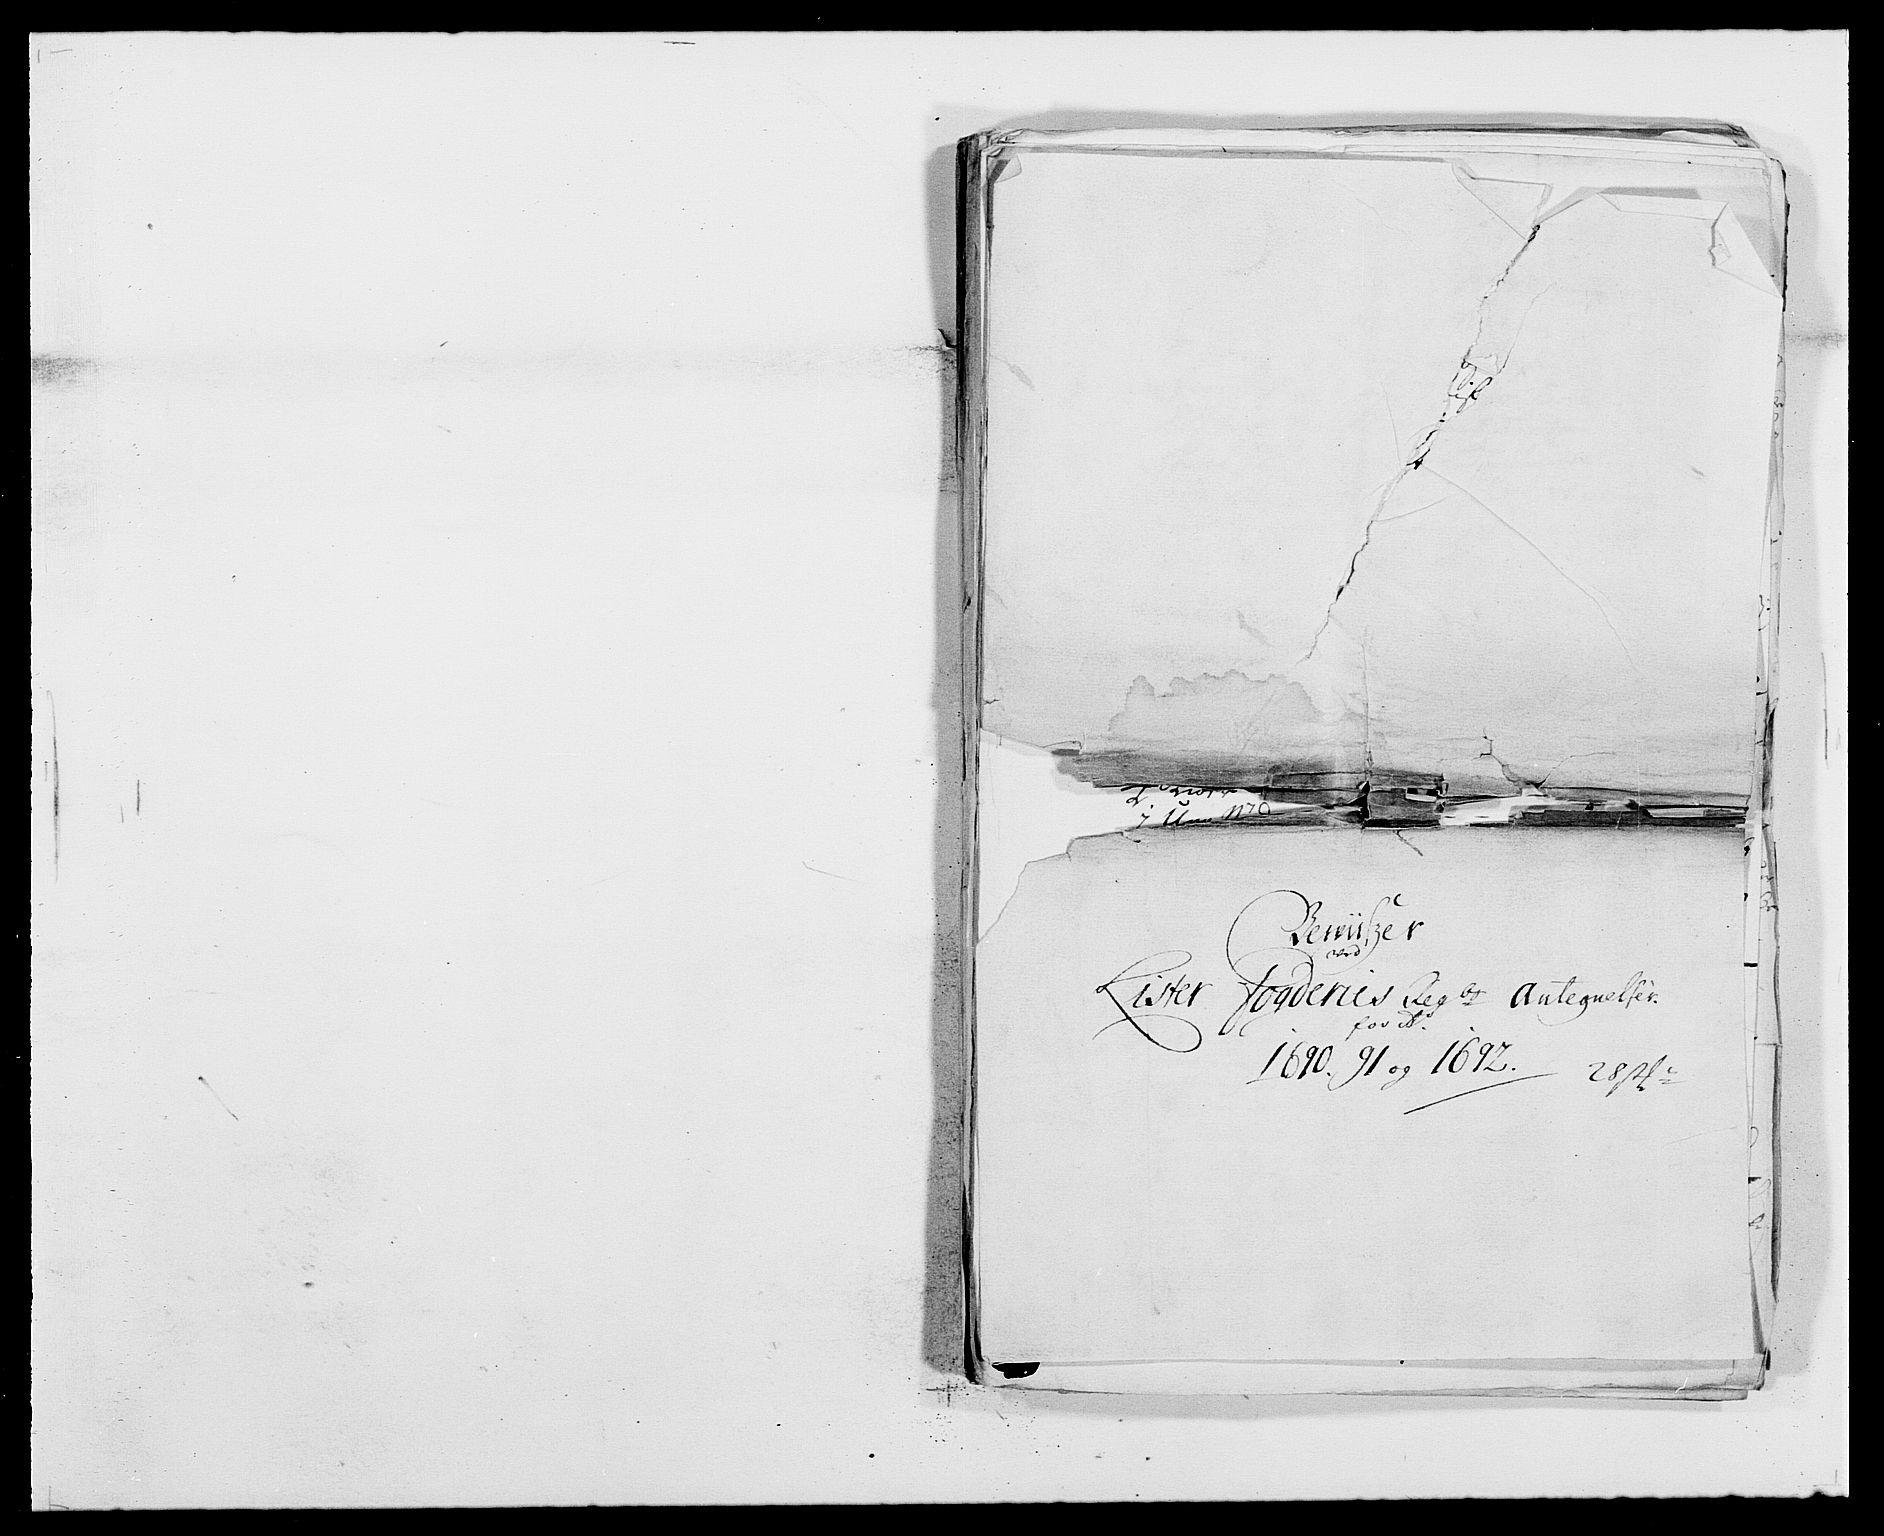 RA, Rentekammeret inntil 1814, Reviderte regnskaper, Fogderegnskap, R41/L2536: Fogderegnskap Lista, 1690-1693, s. 345